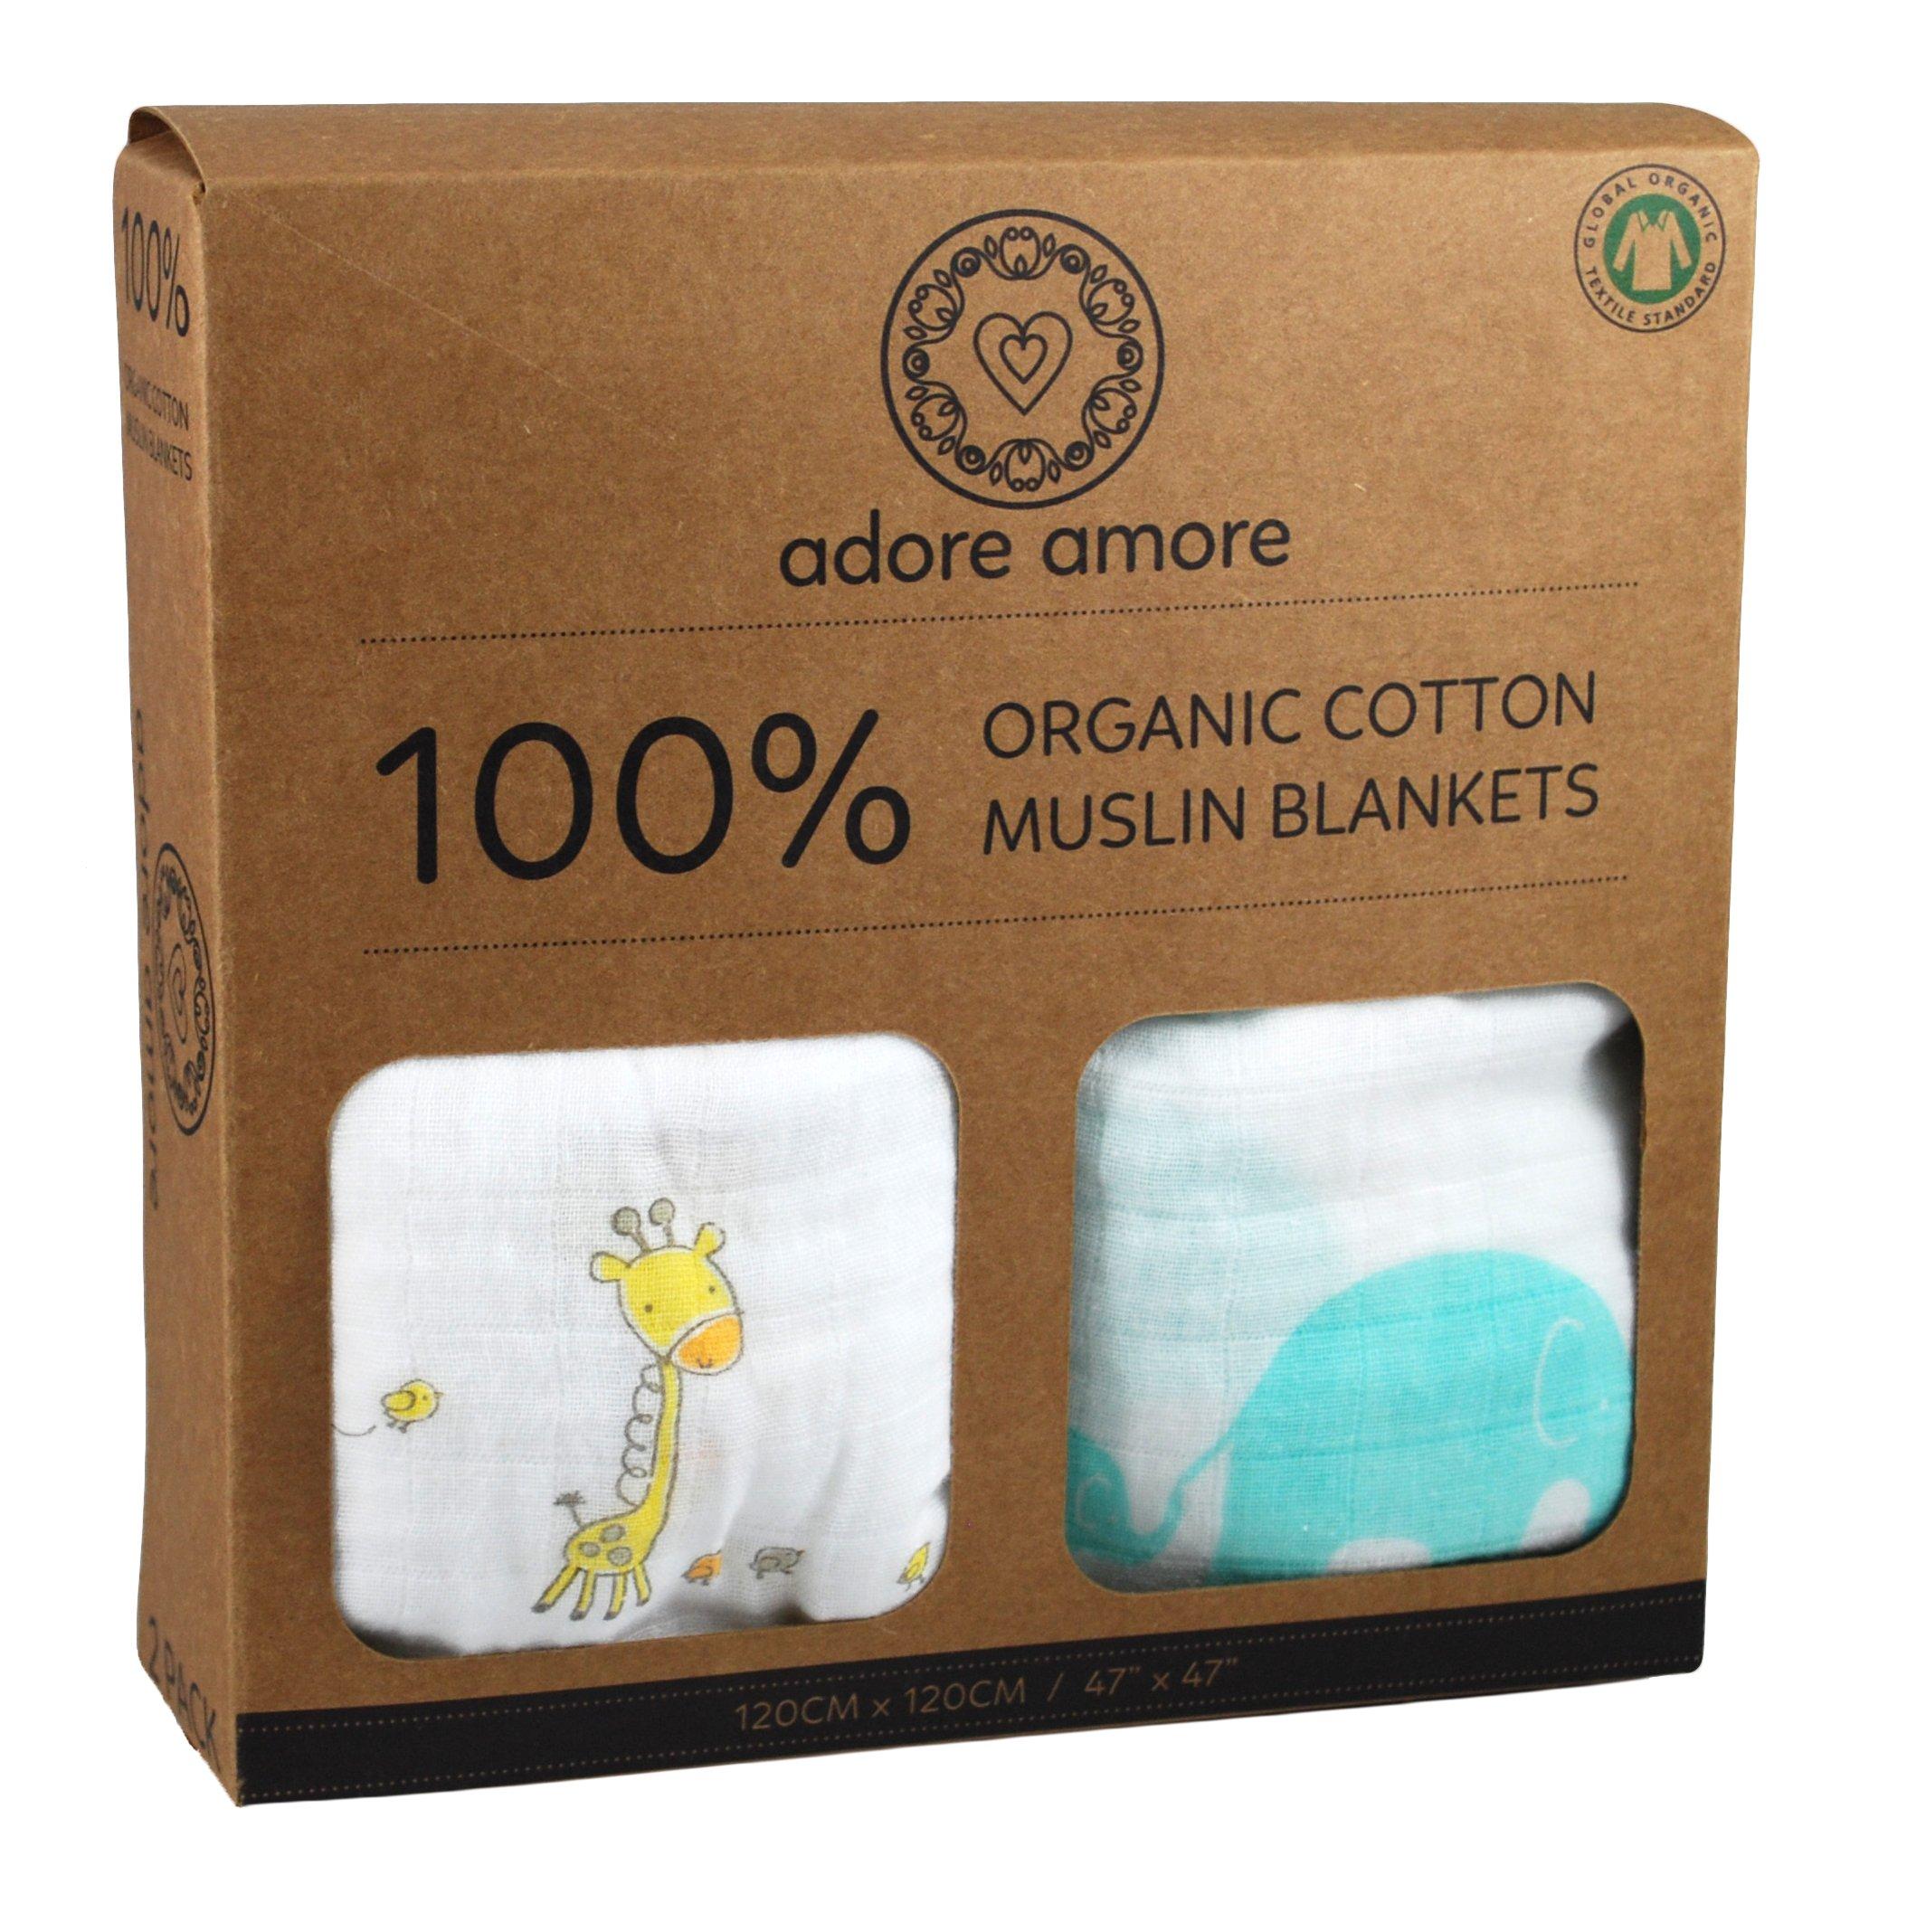 "Adore Amore | 2-Pack Organic Cotton Muslin Swaddle Blankets | Baby Shower Gift Set Boy Girl | Crib Stroller Receiving | Soft Natural Newborn Unisex | X Large Wrap 47"" x 47"" | Elephant & Giraffe"